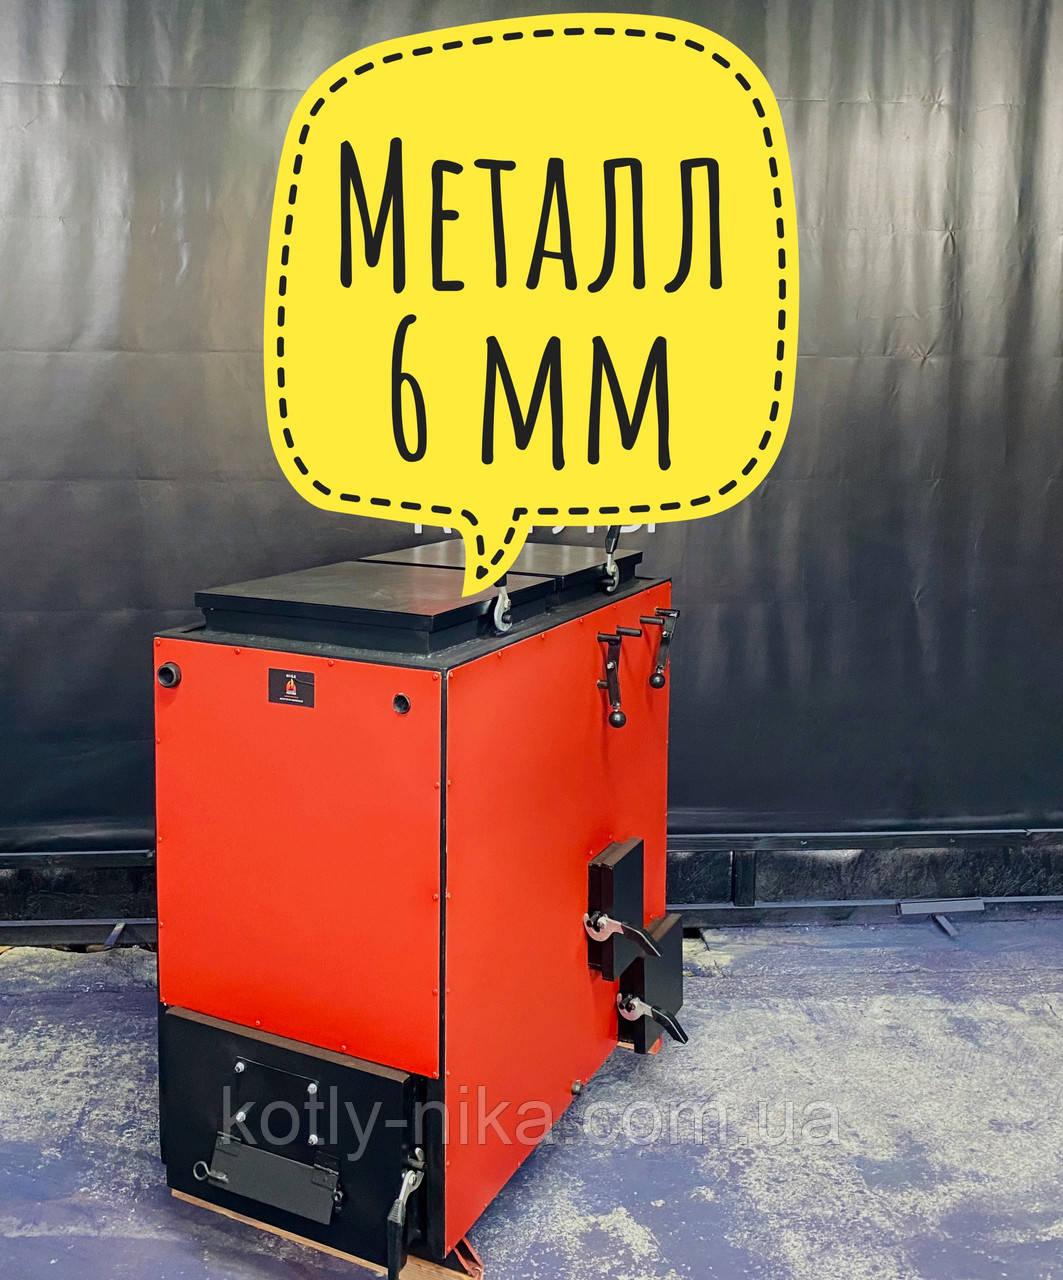 Котел Питон 10 кВт с регулировкой мощности МЕТАЛЛ 6 мм